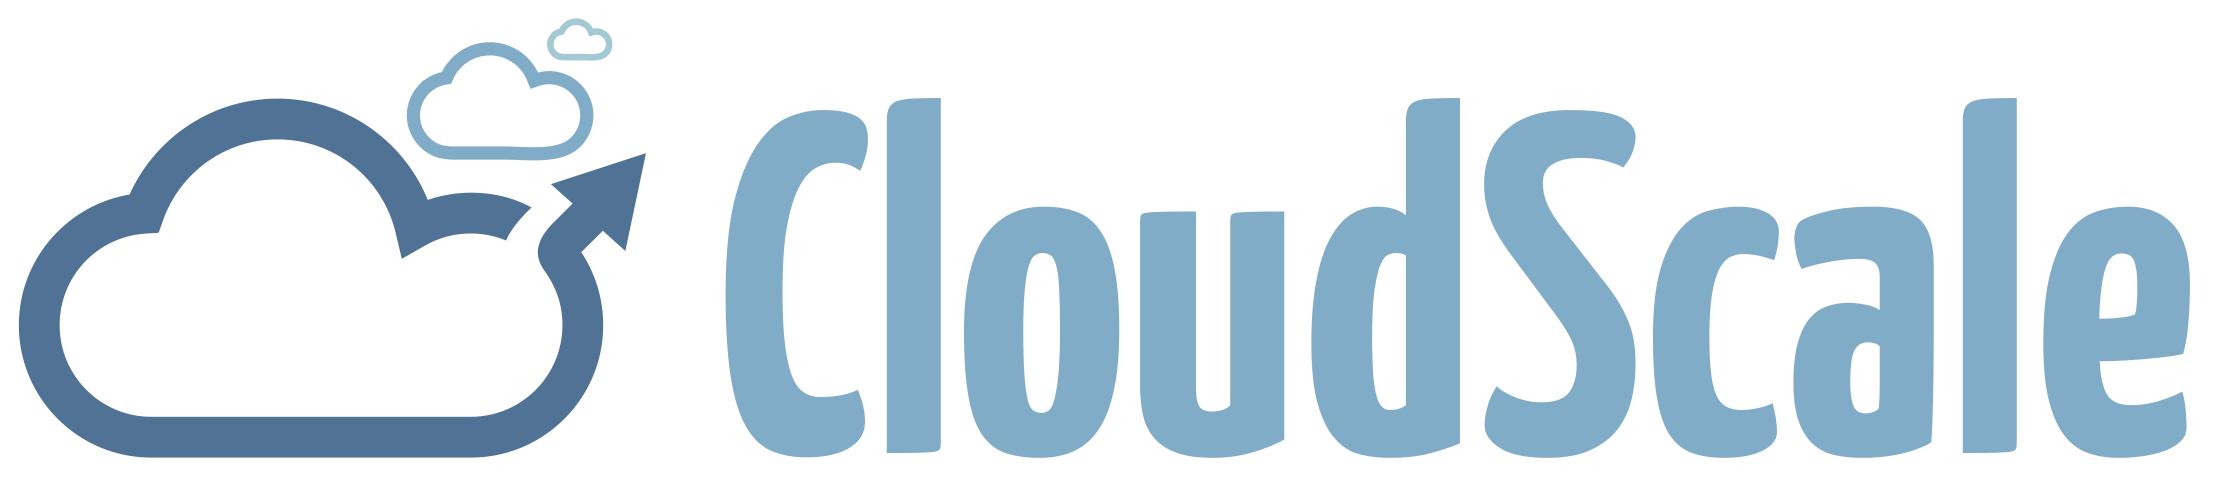 cloud scale